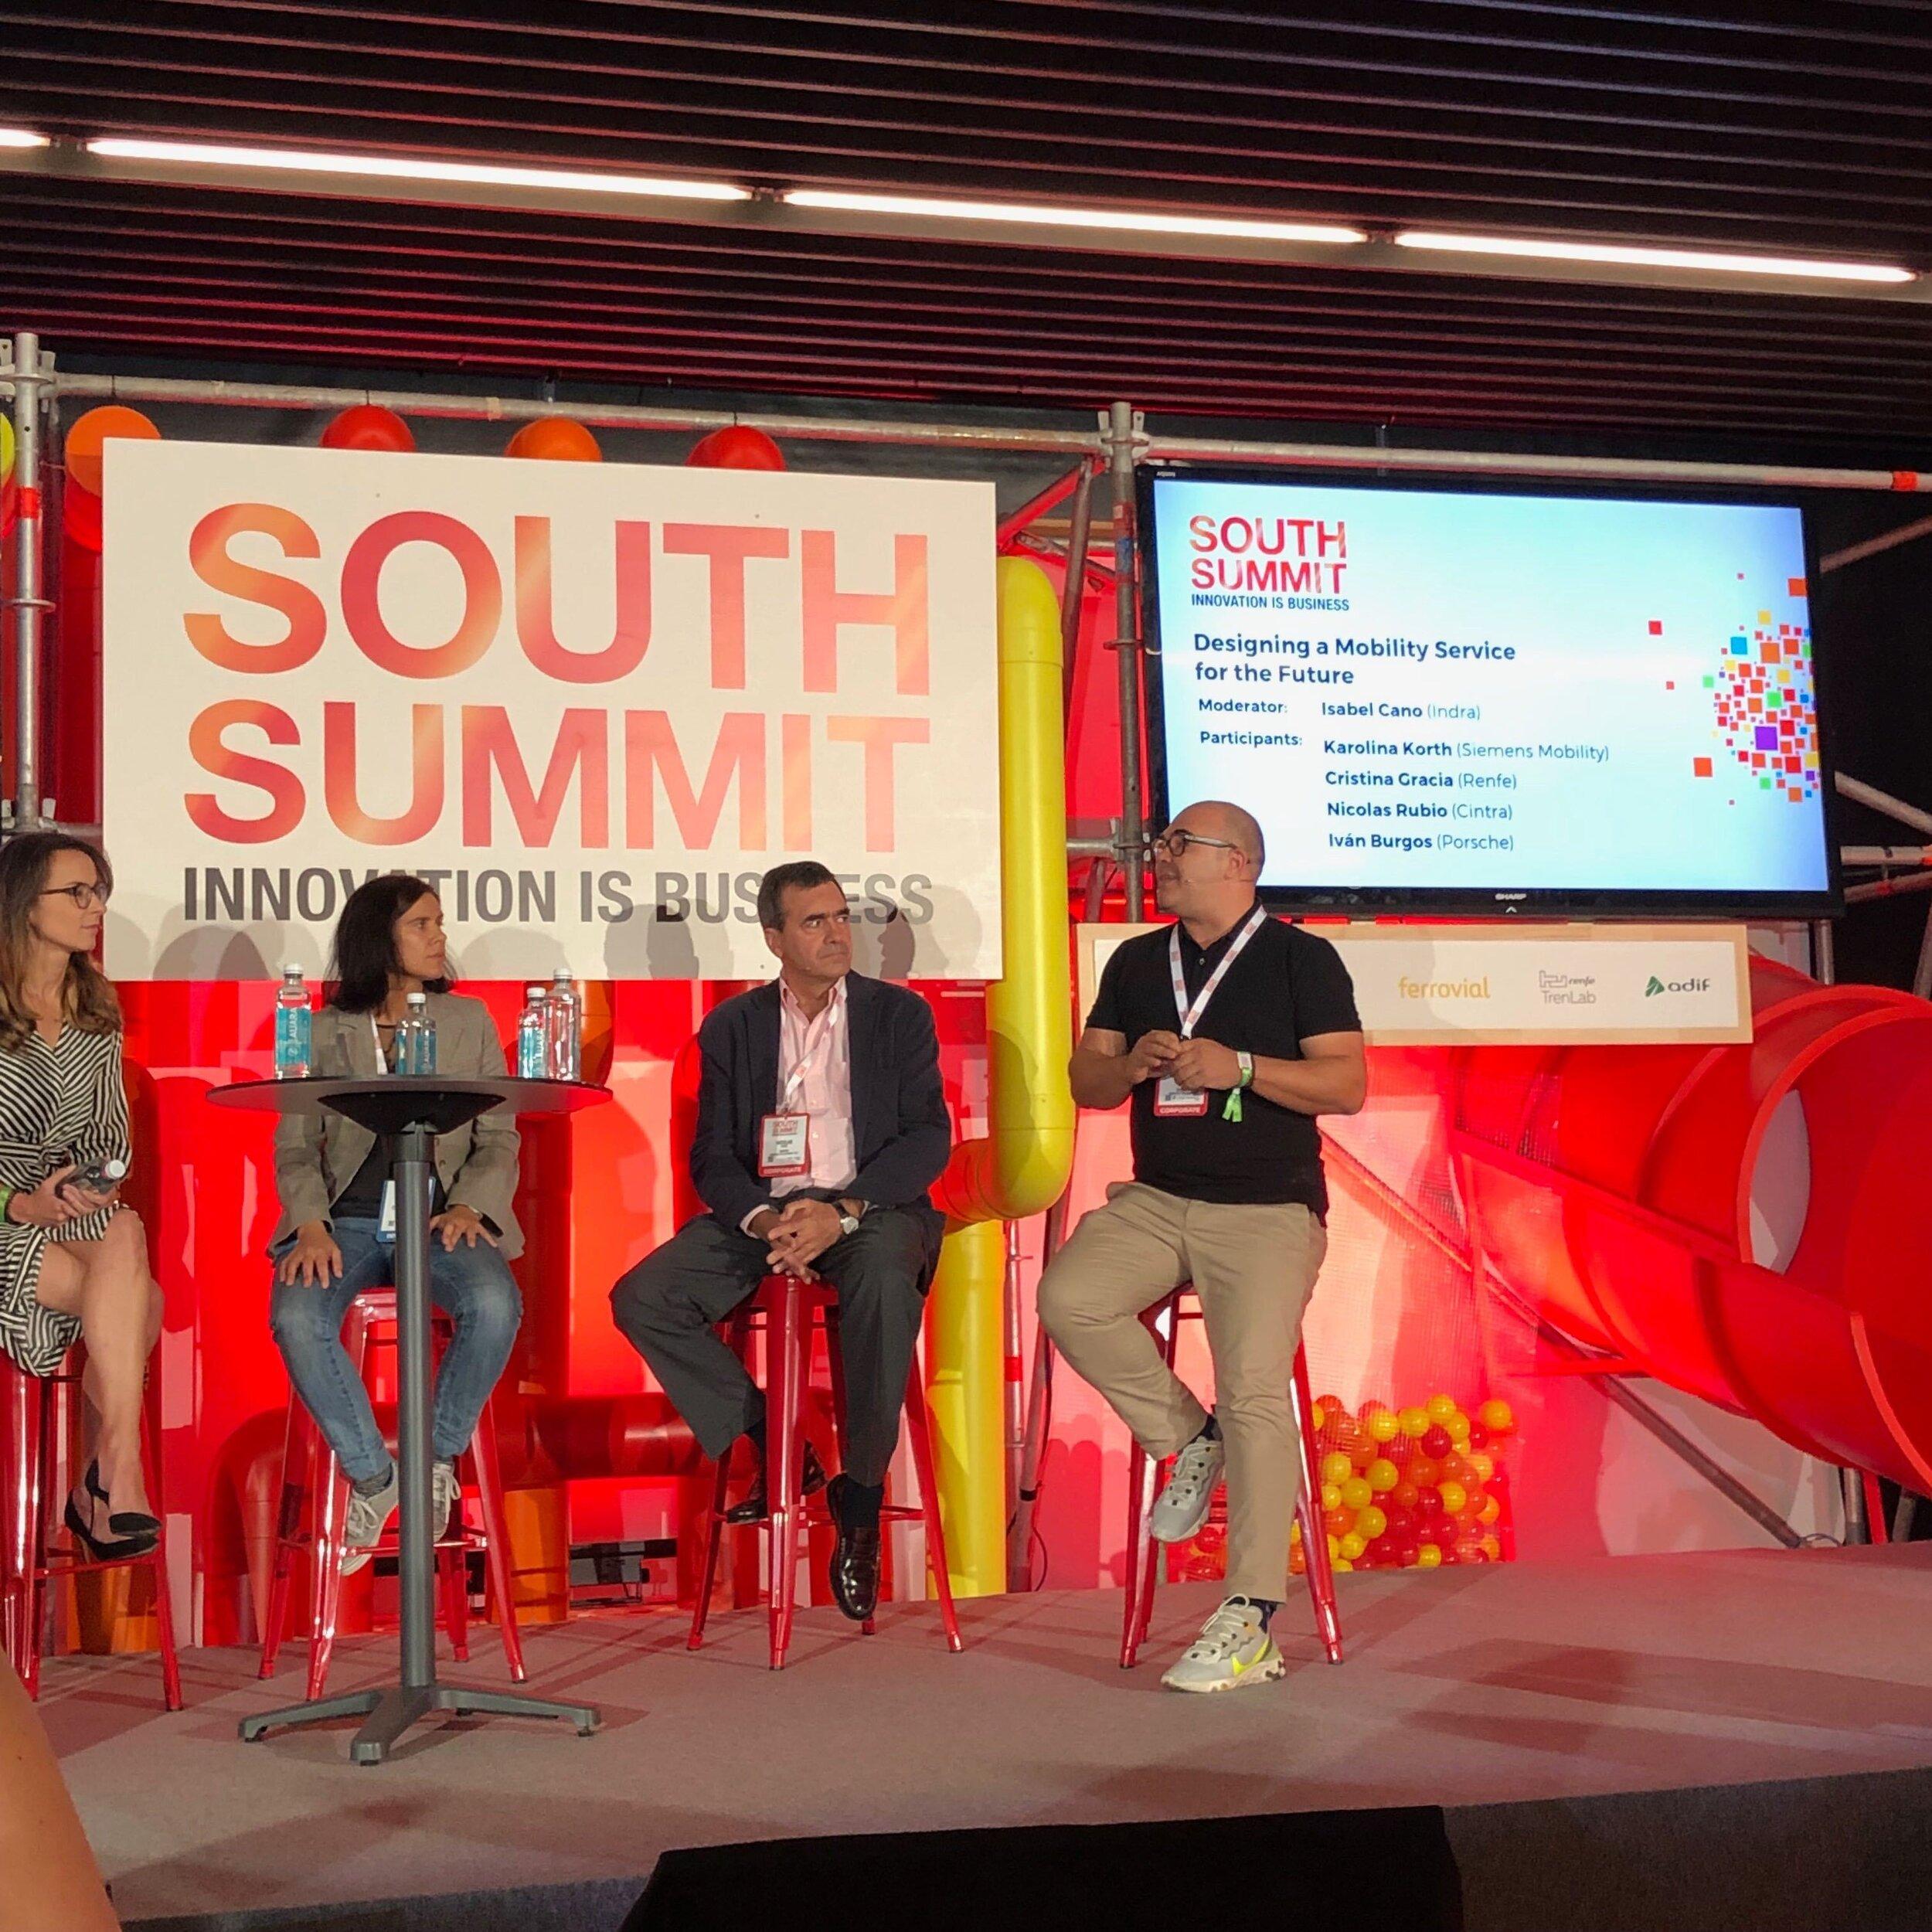 South Summit2.JPG